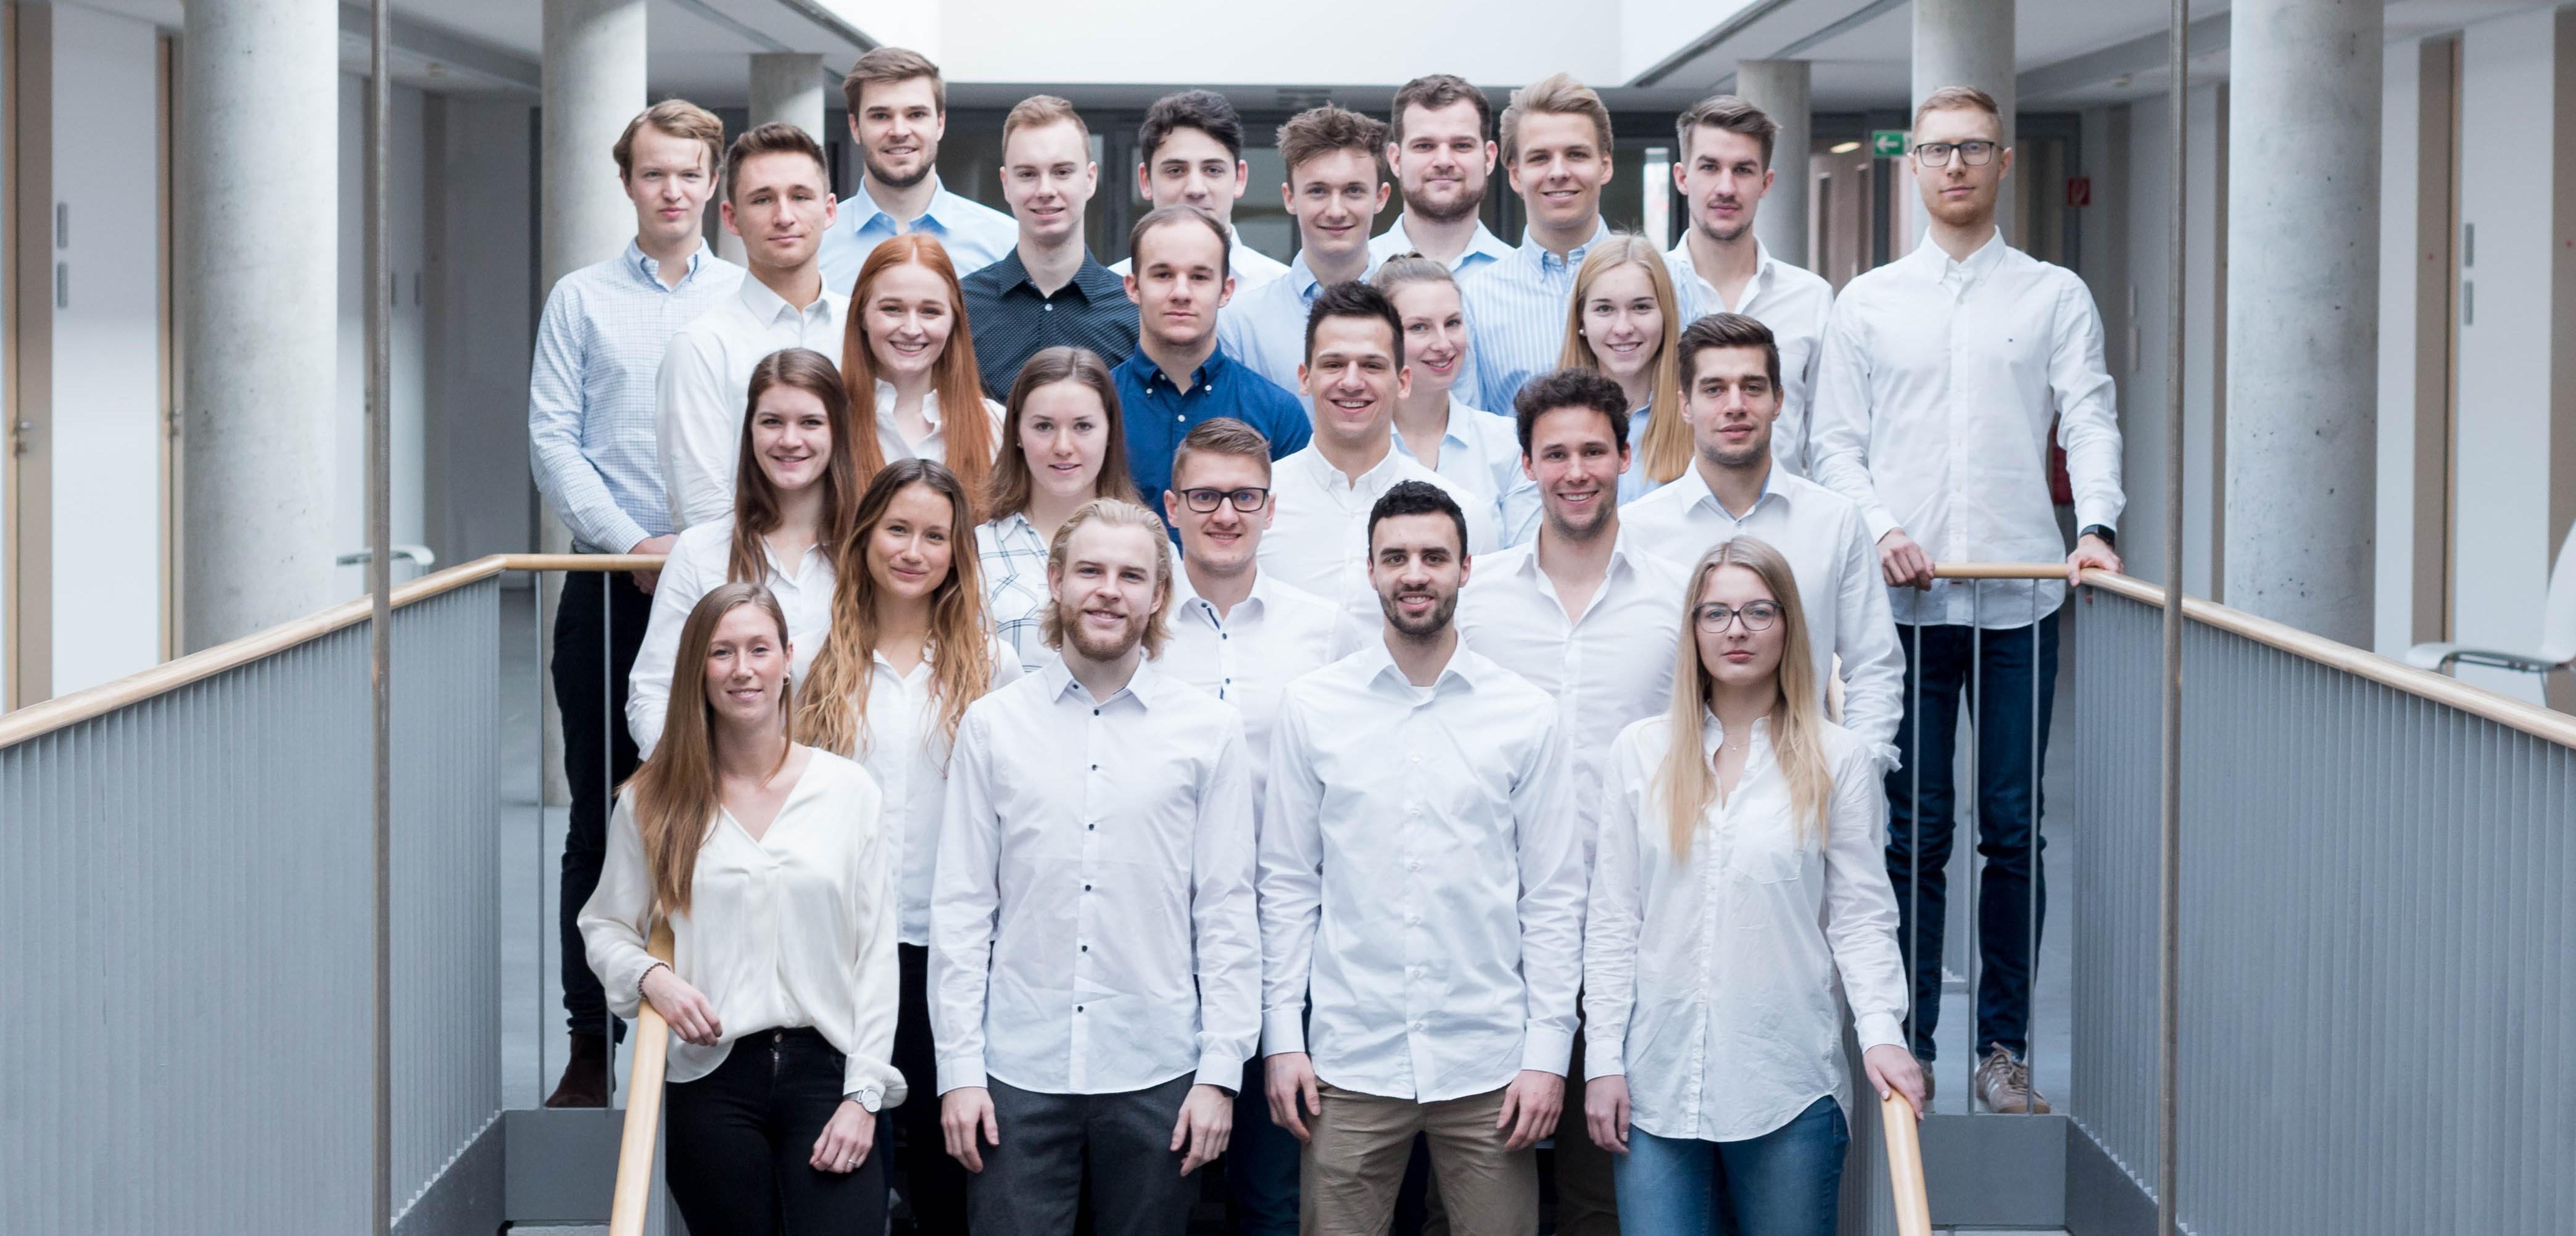 Das gesamte SPC-Team 2019; © matchinglightphotography.de